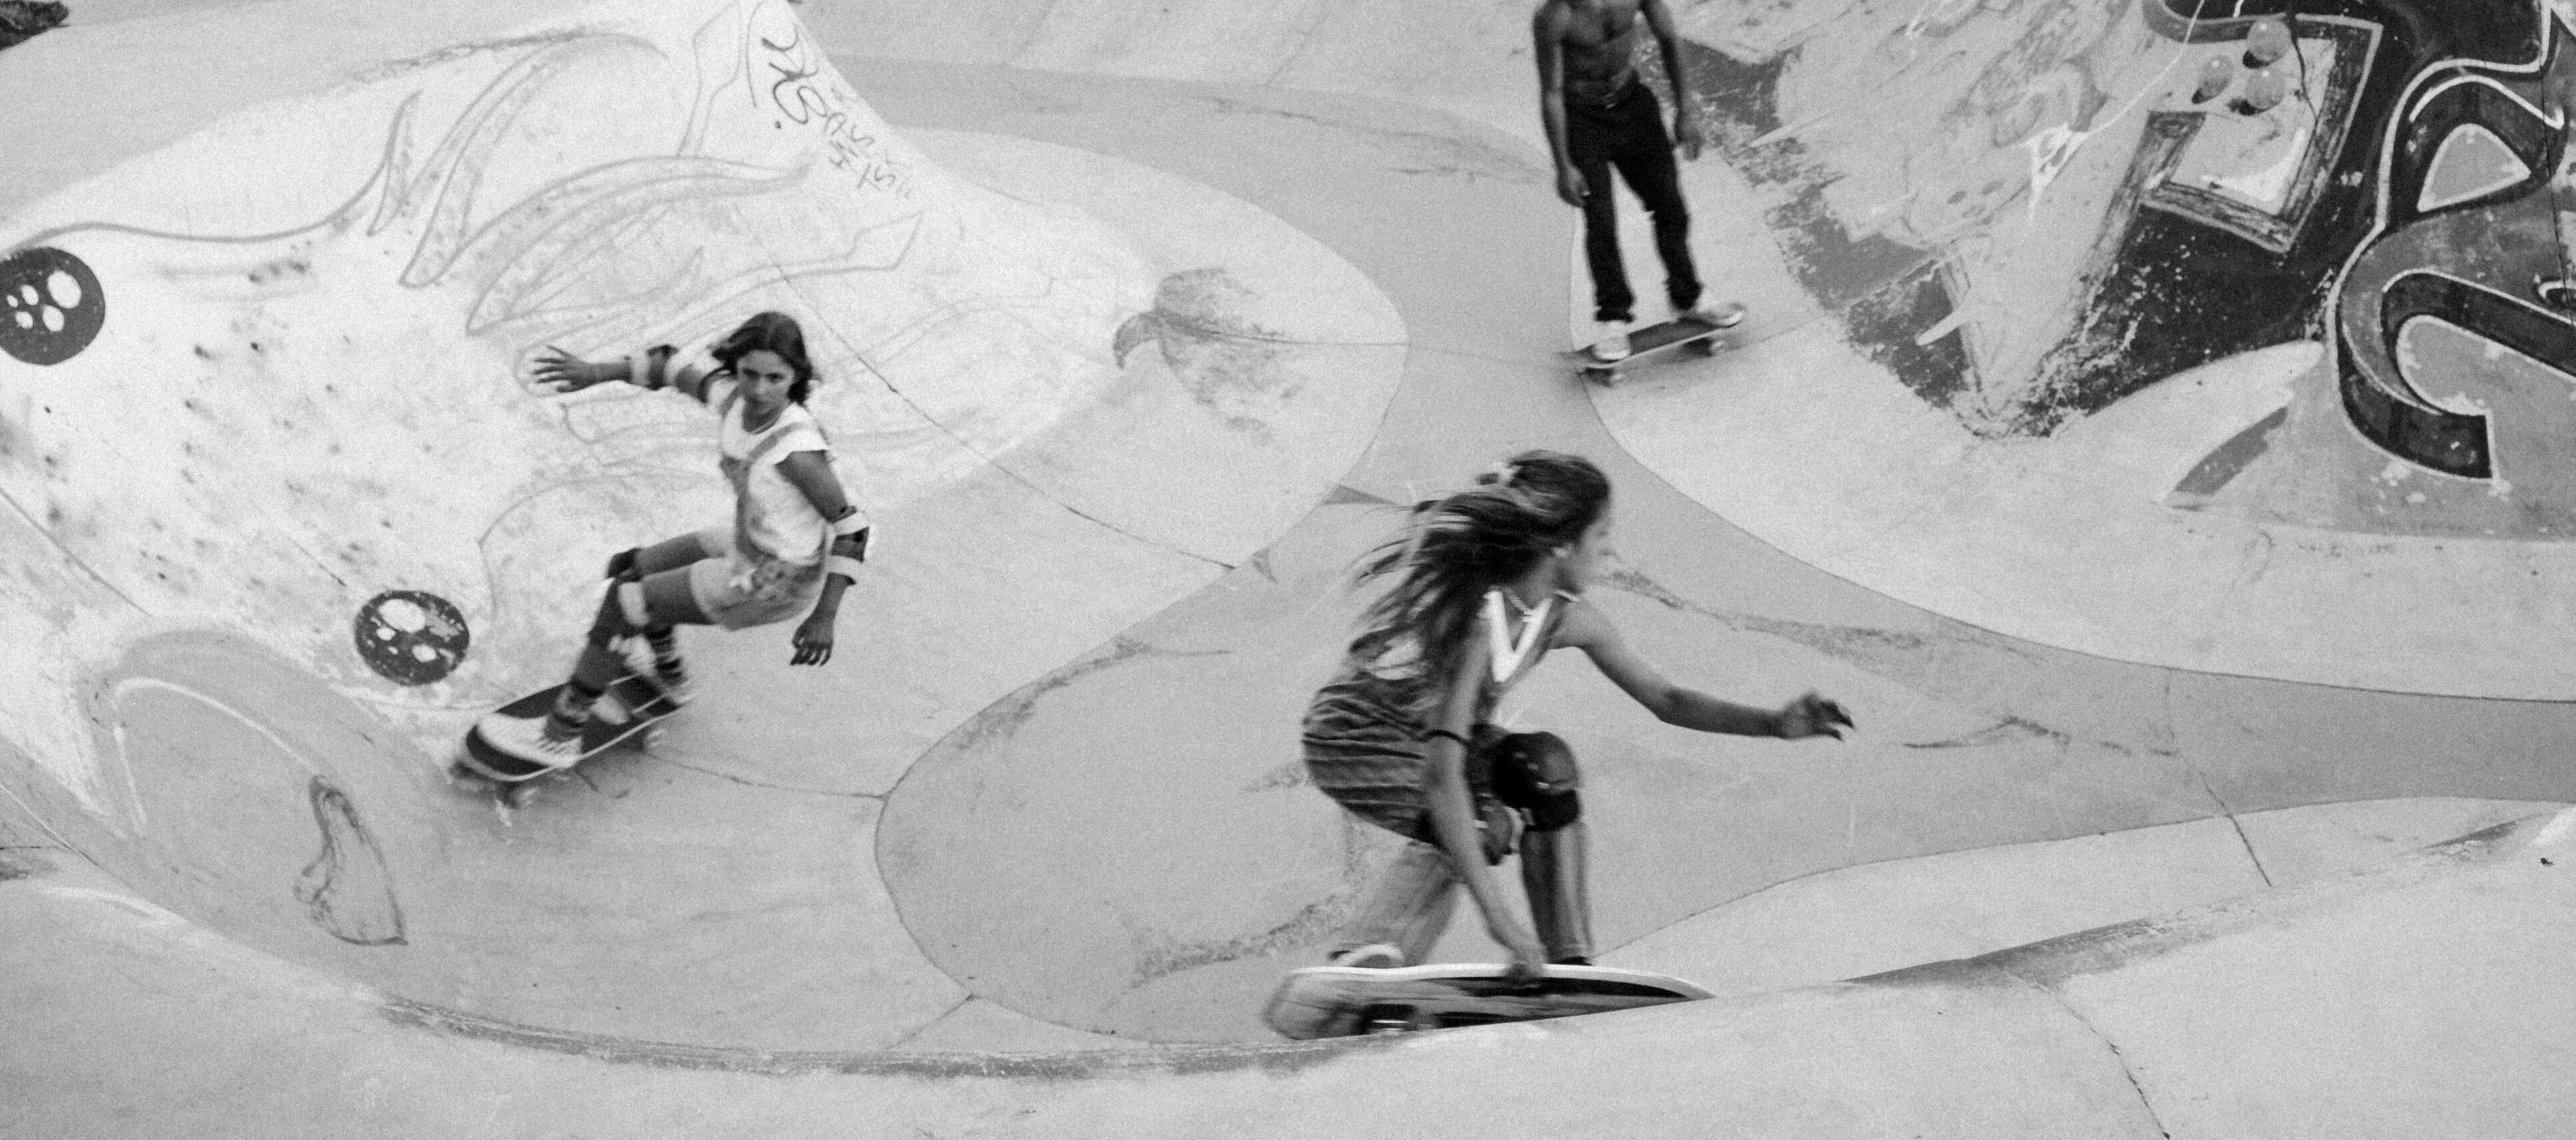 El boom del Skatesurf